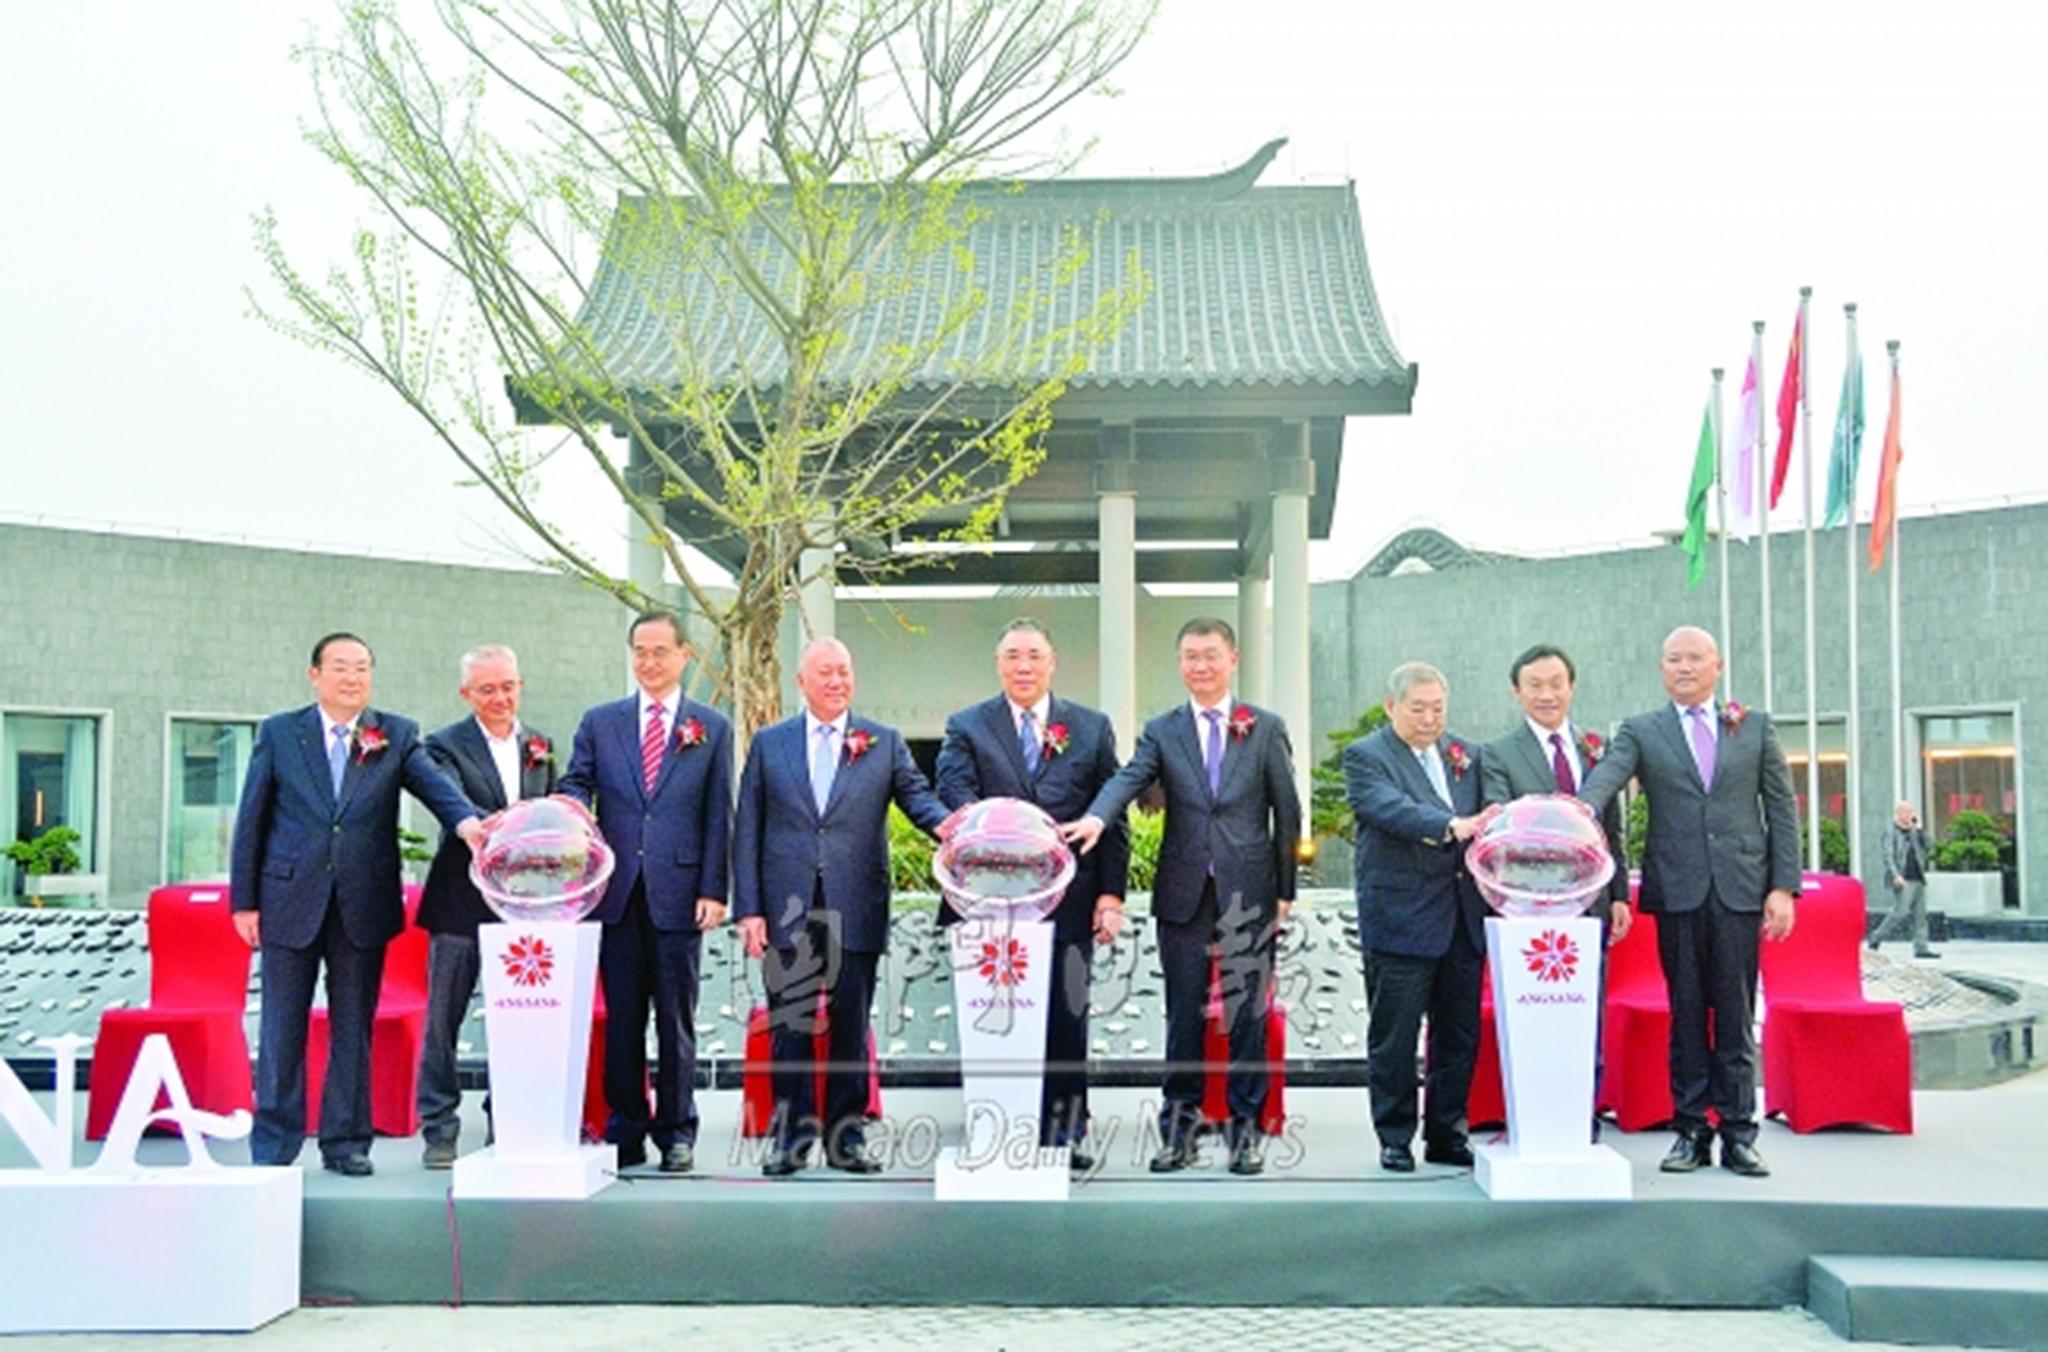 Zhuhai | Governantes presentes na abertura de hotel de Chan Meng Kam